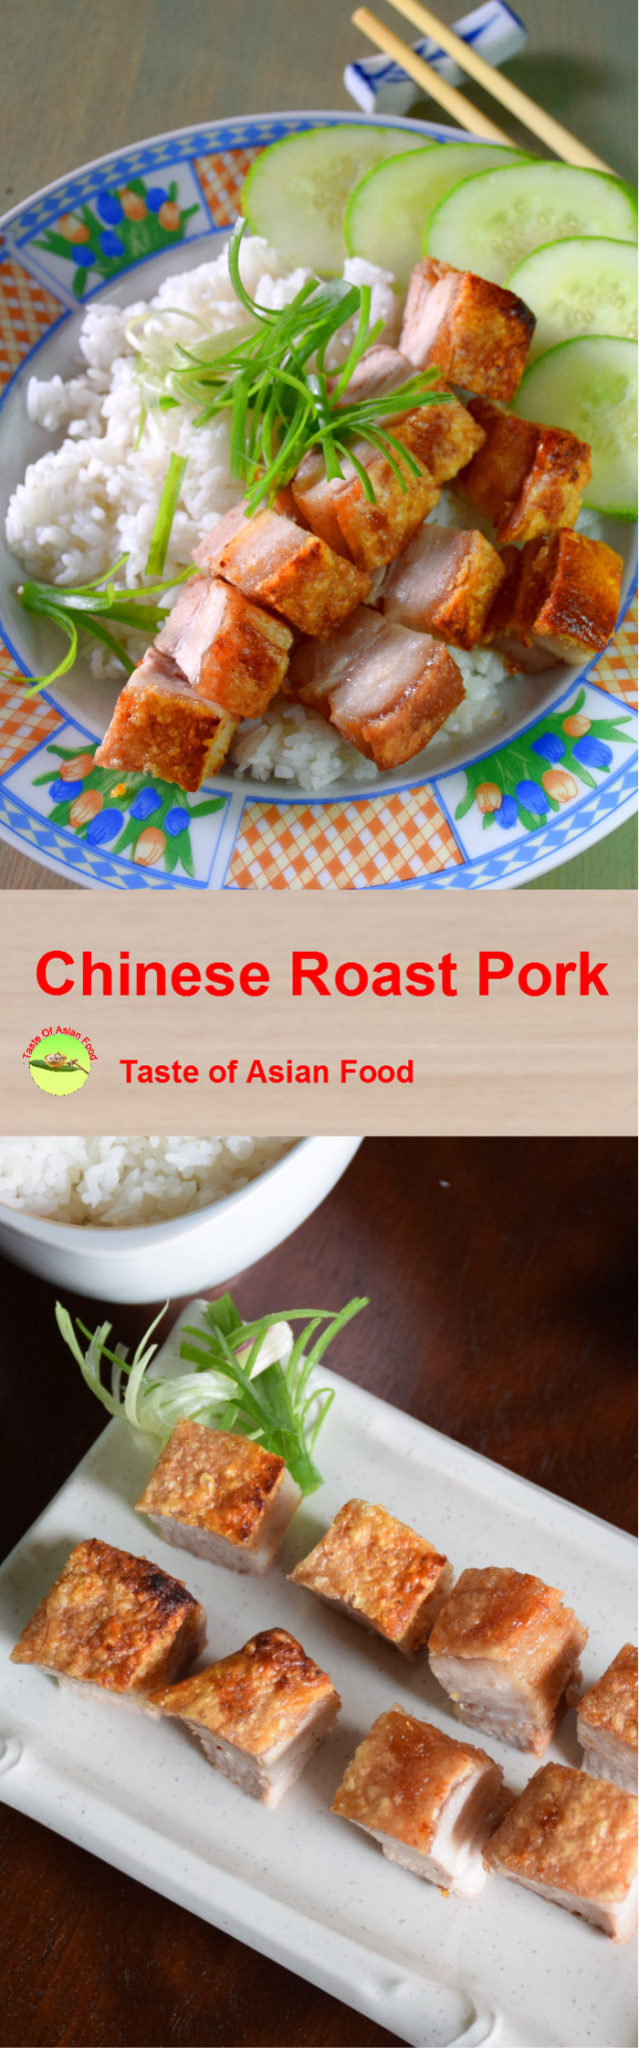 Chinese roast pork to pin